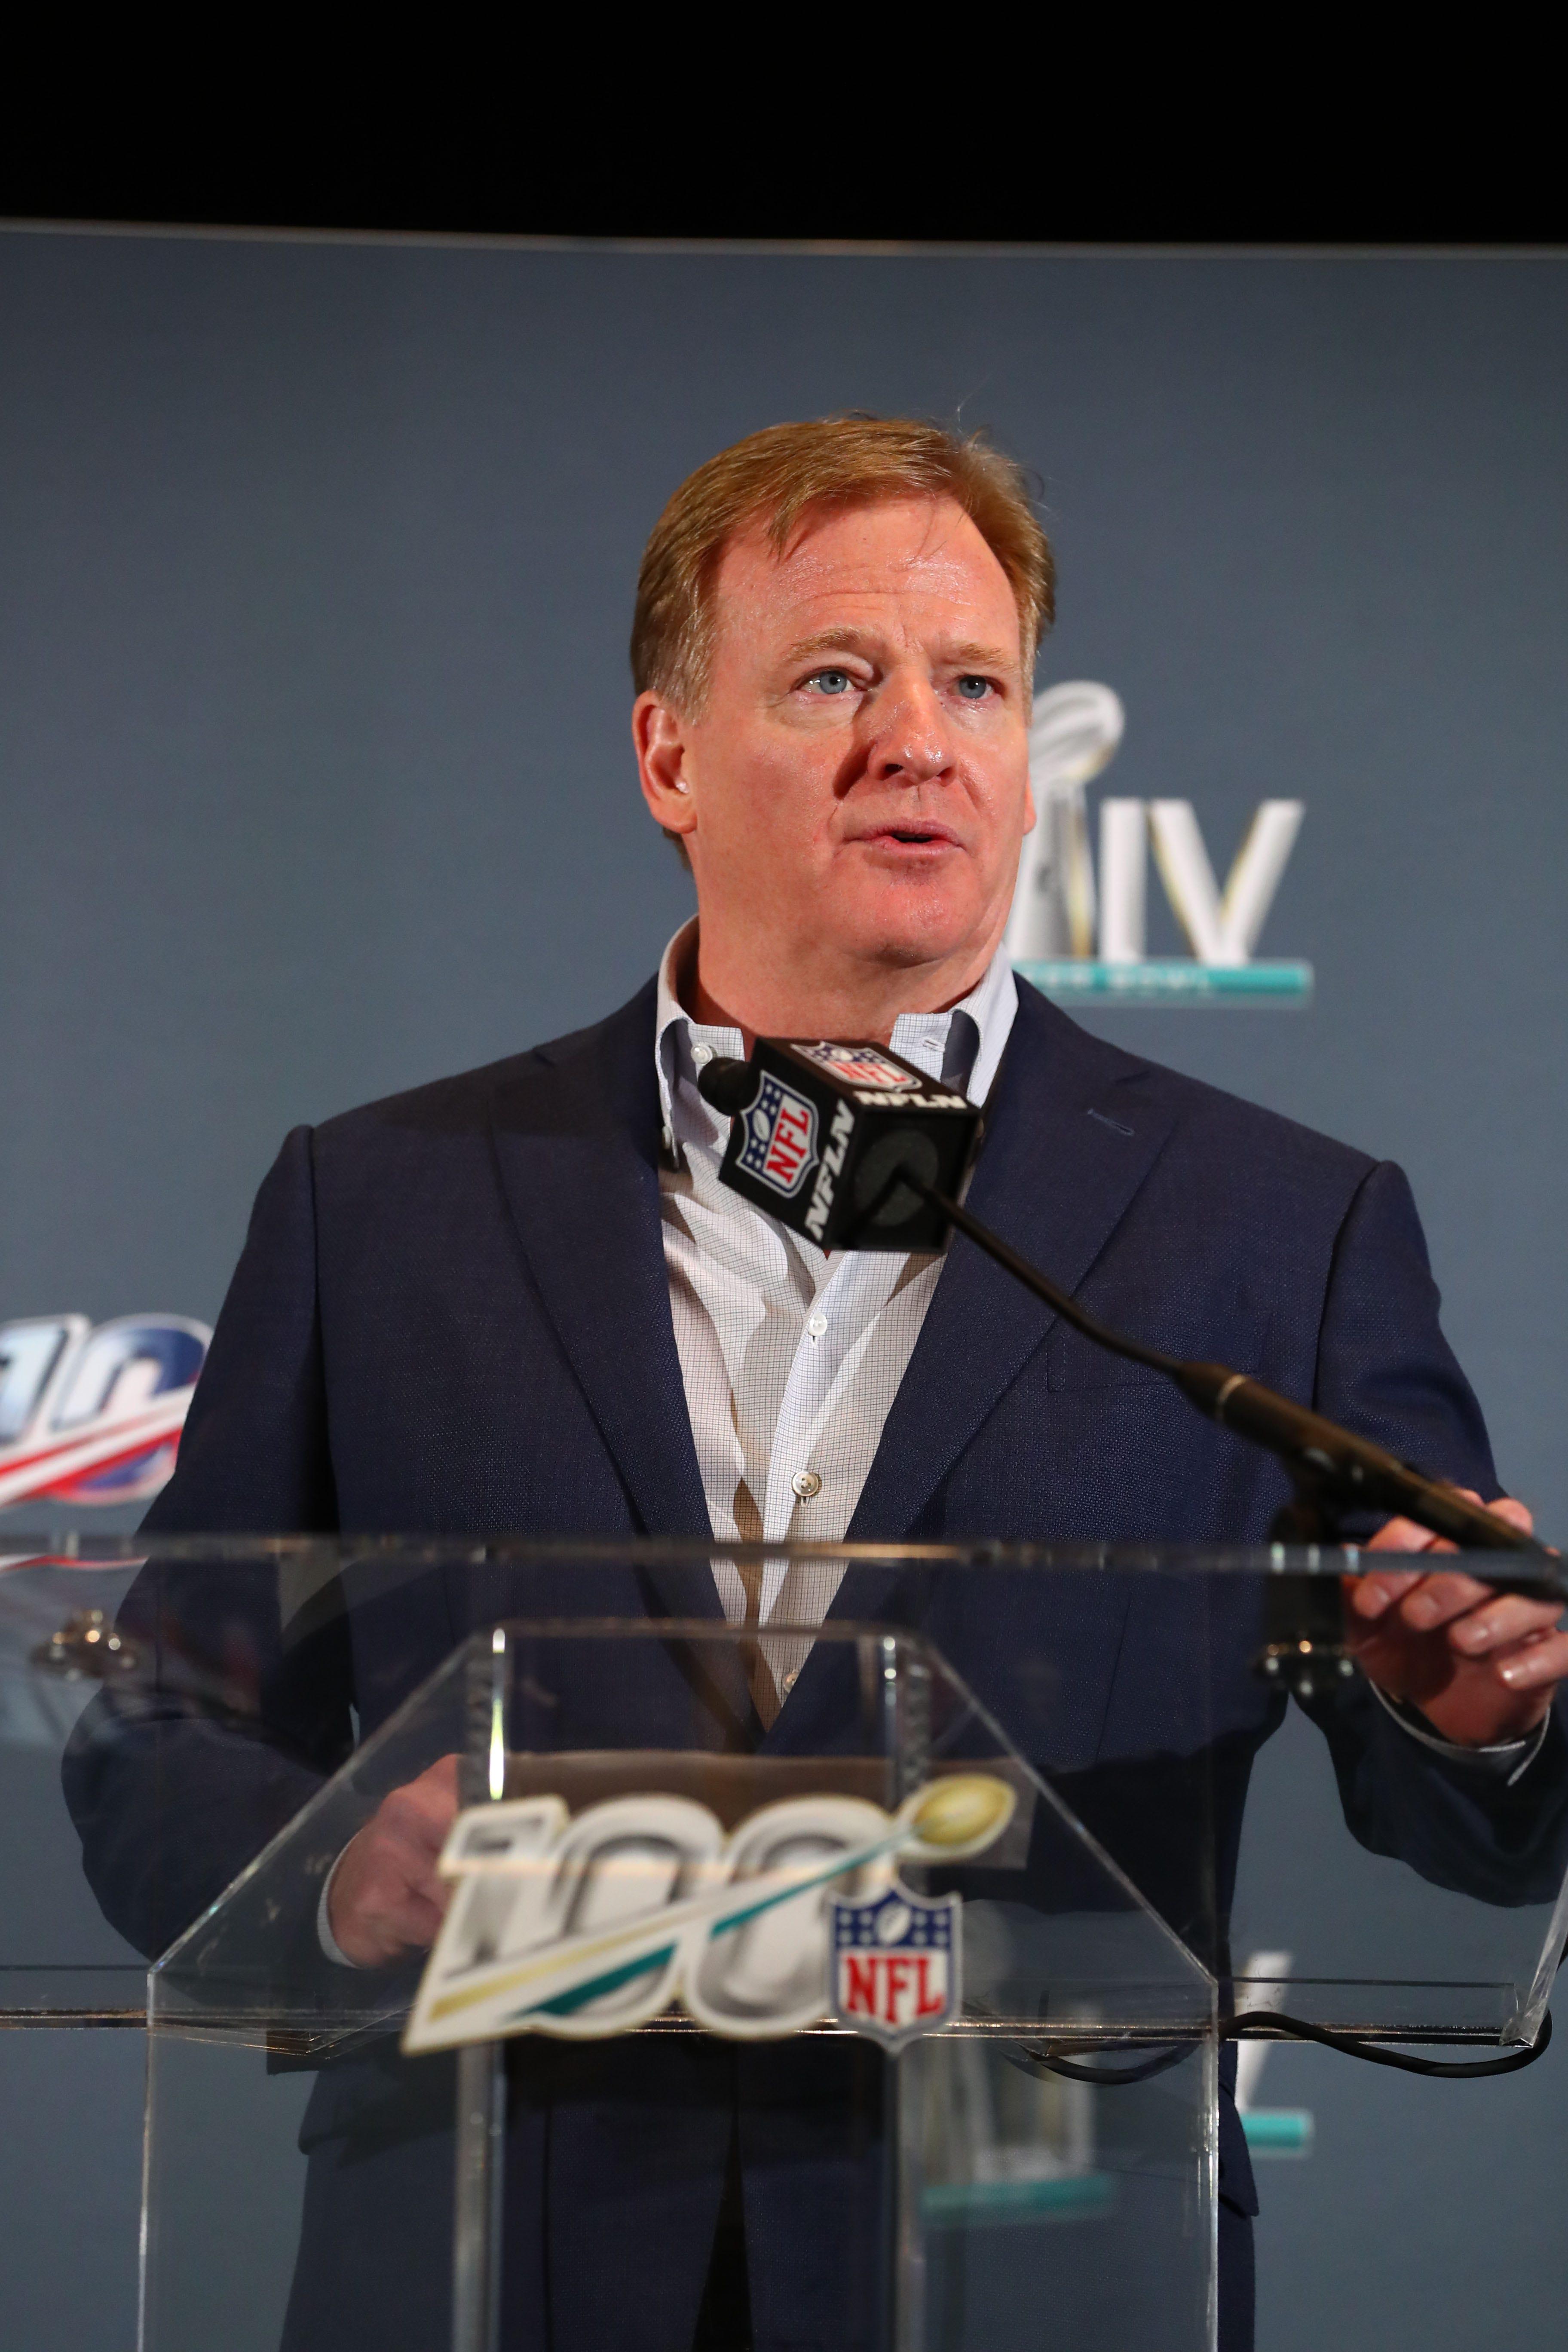 NFL Commissioner Roger Goodell s message for Colin Kaepernick:  I wish we had listened earlier